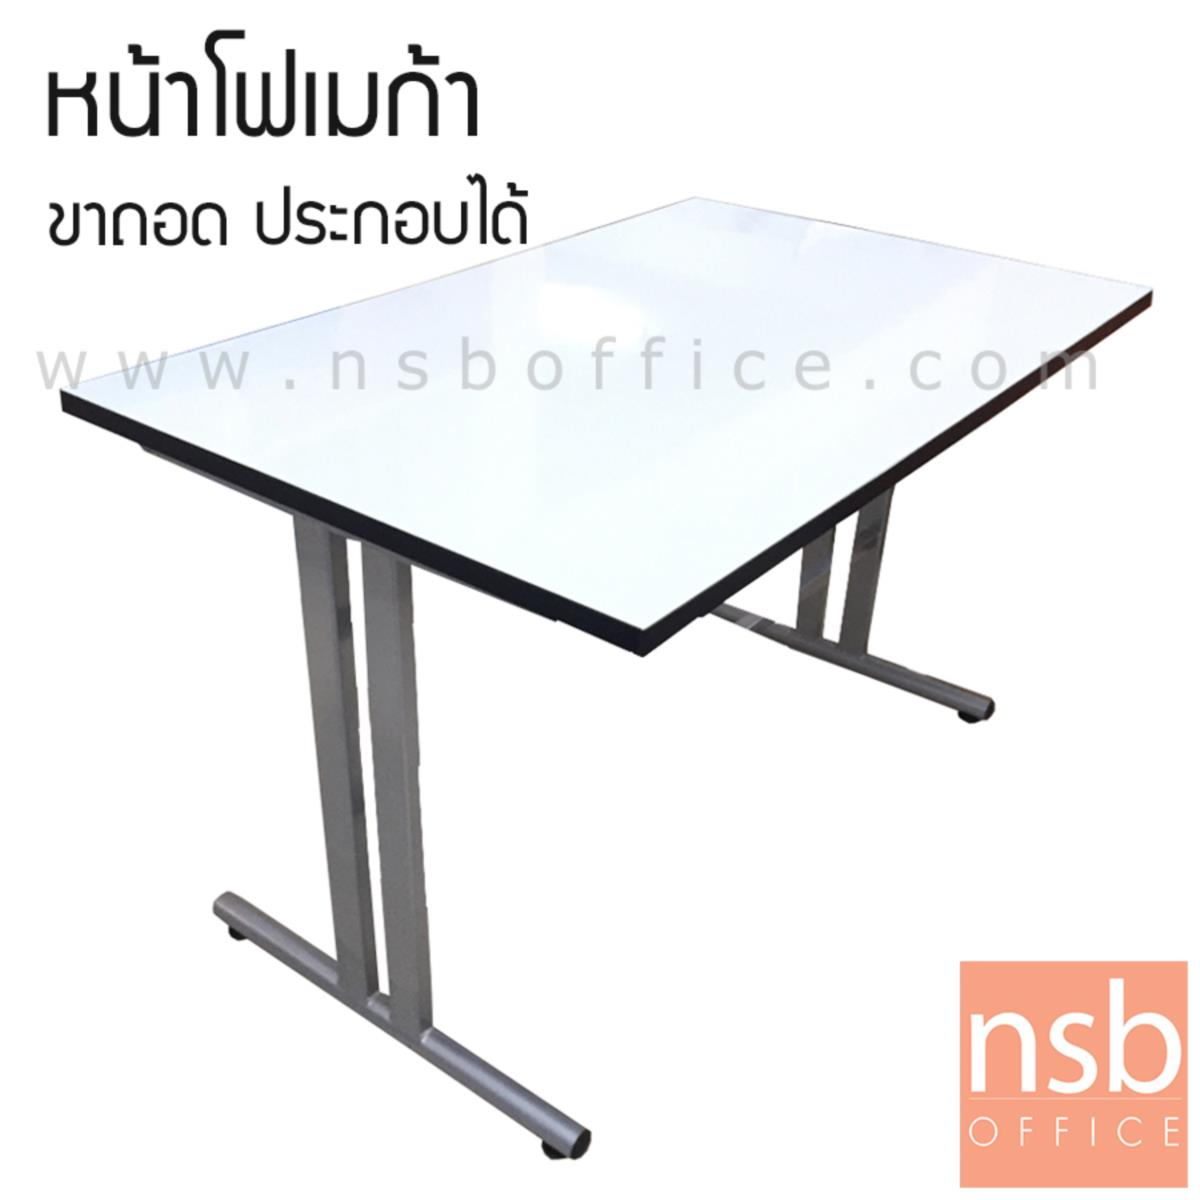 A07A073:โต๊ะประชุมหน้าโฟเมก้าขาว รุ่น thatch (แธช)  โครงขาถอดประกอบได้